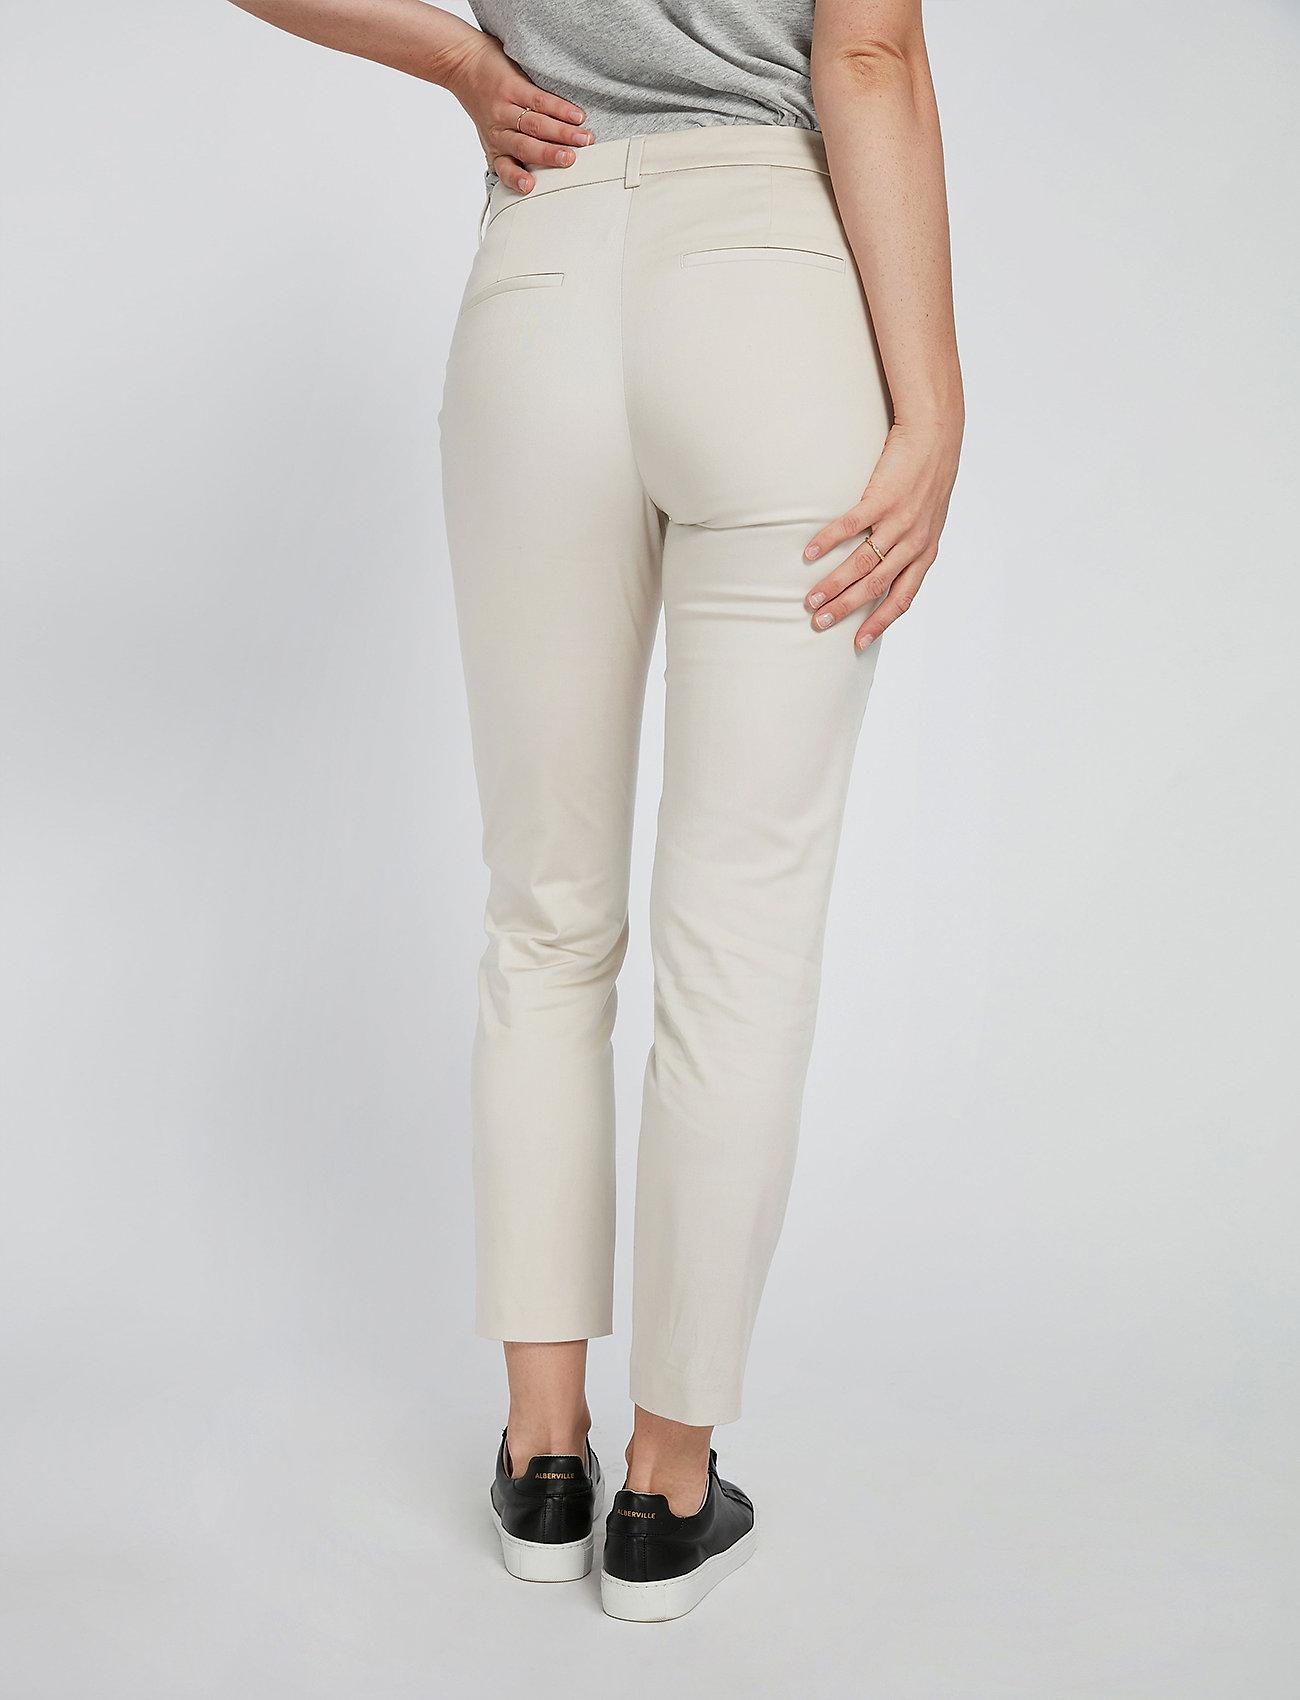 FIVEUNITS - Kylie Crop 531 - bukser med lige ben - moonbeam - 3